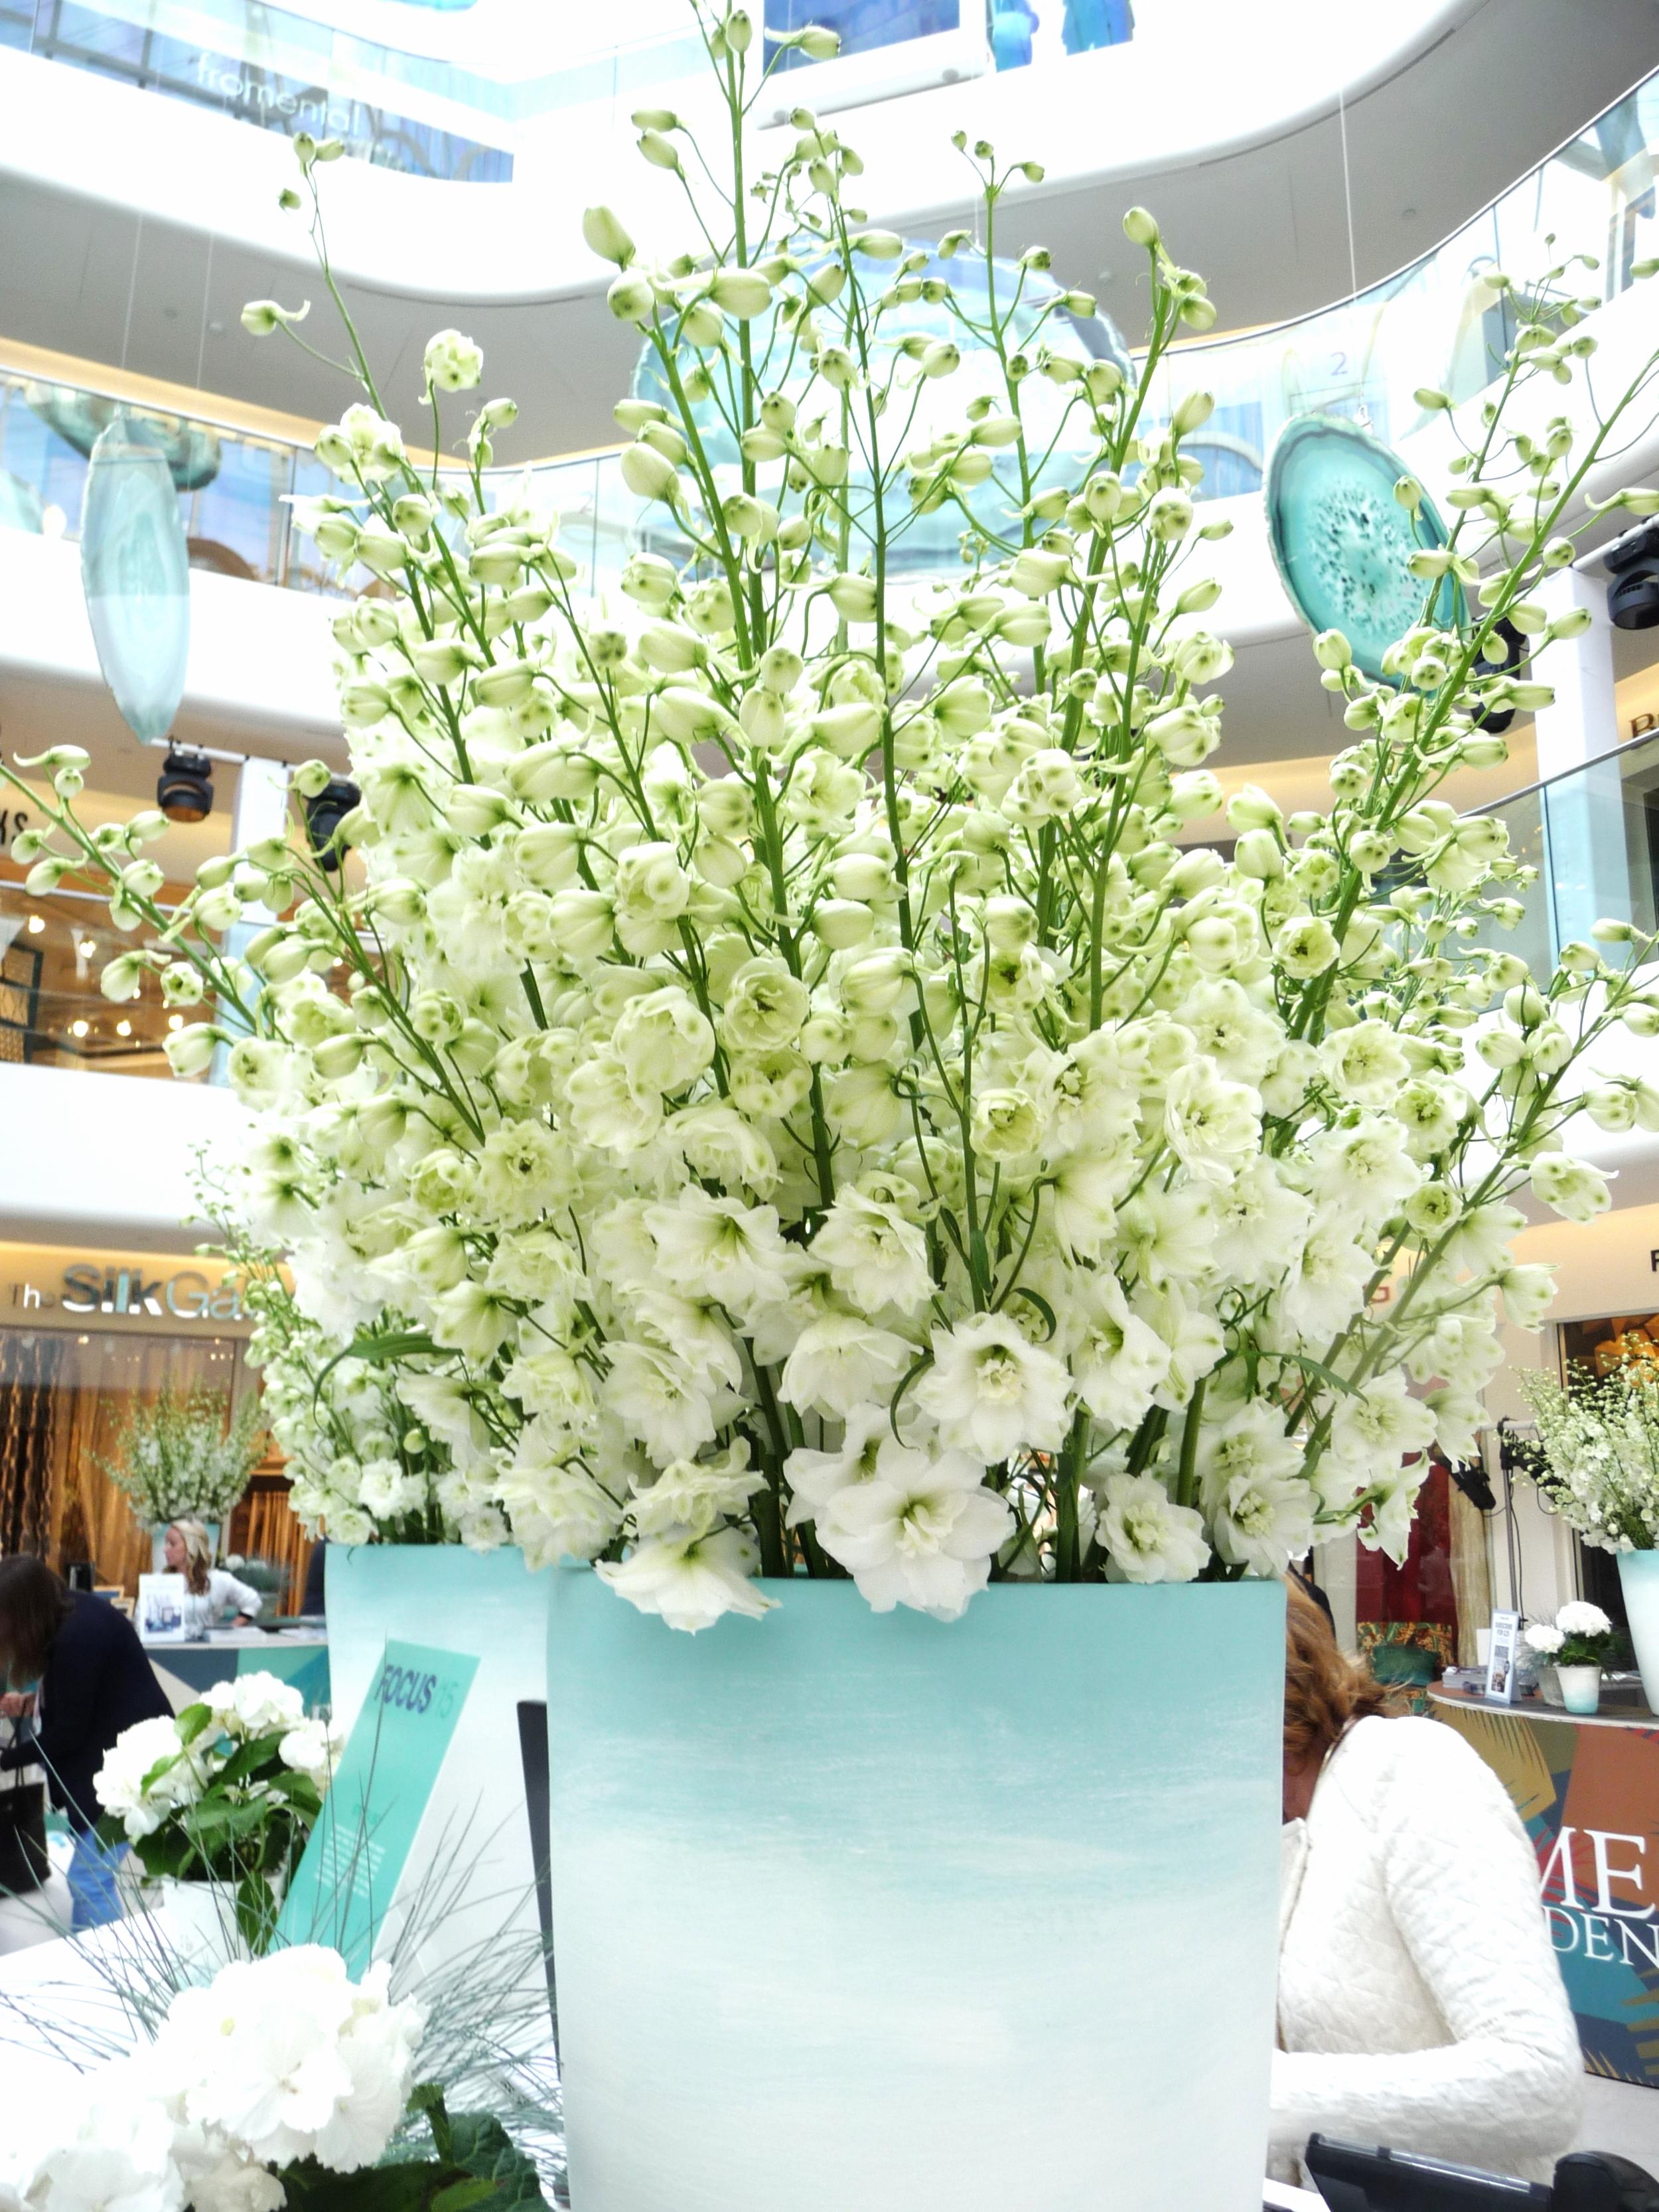 Stunning white delphiniums